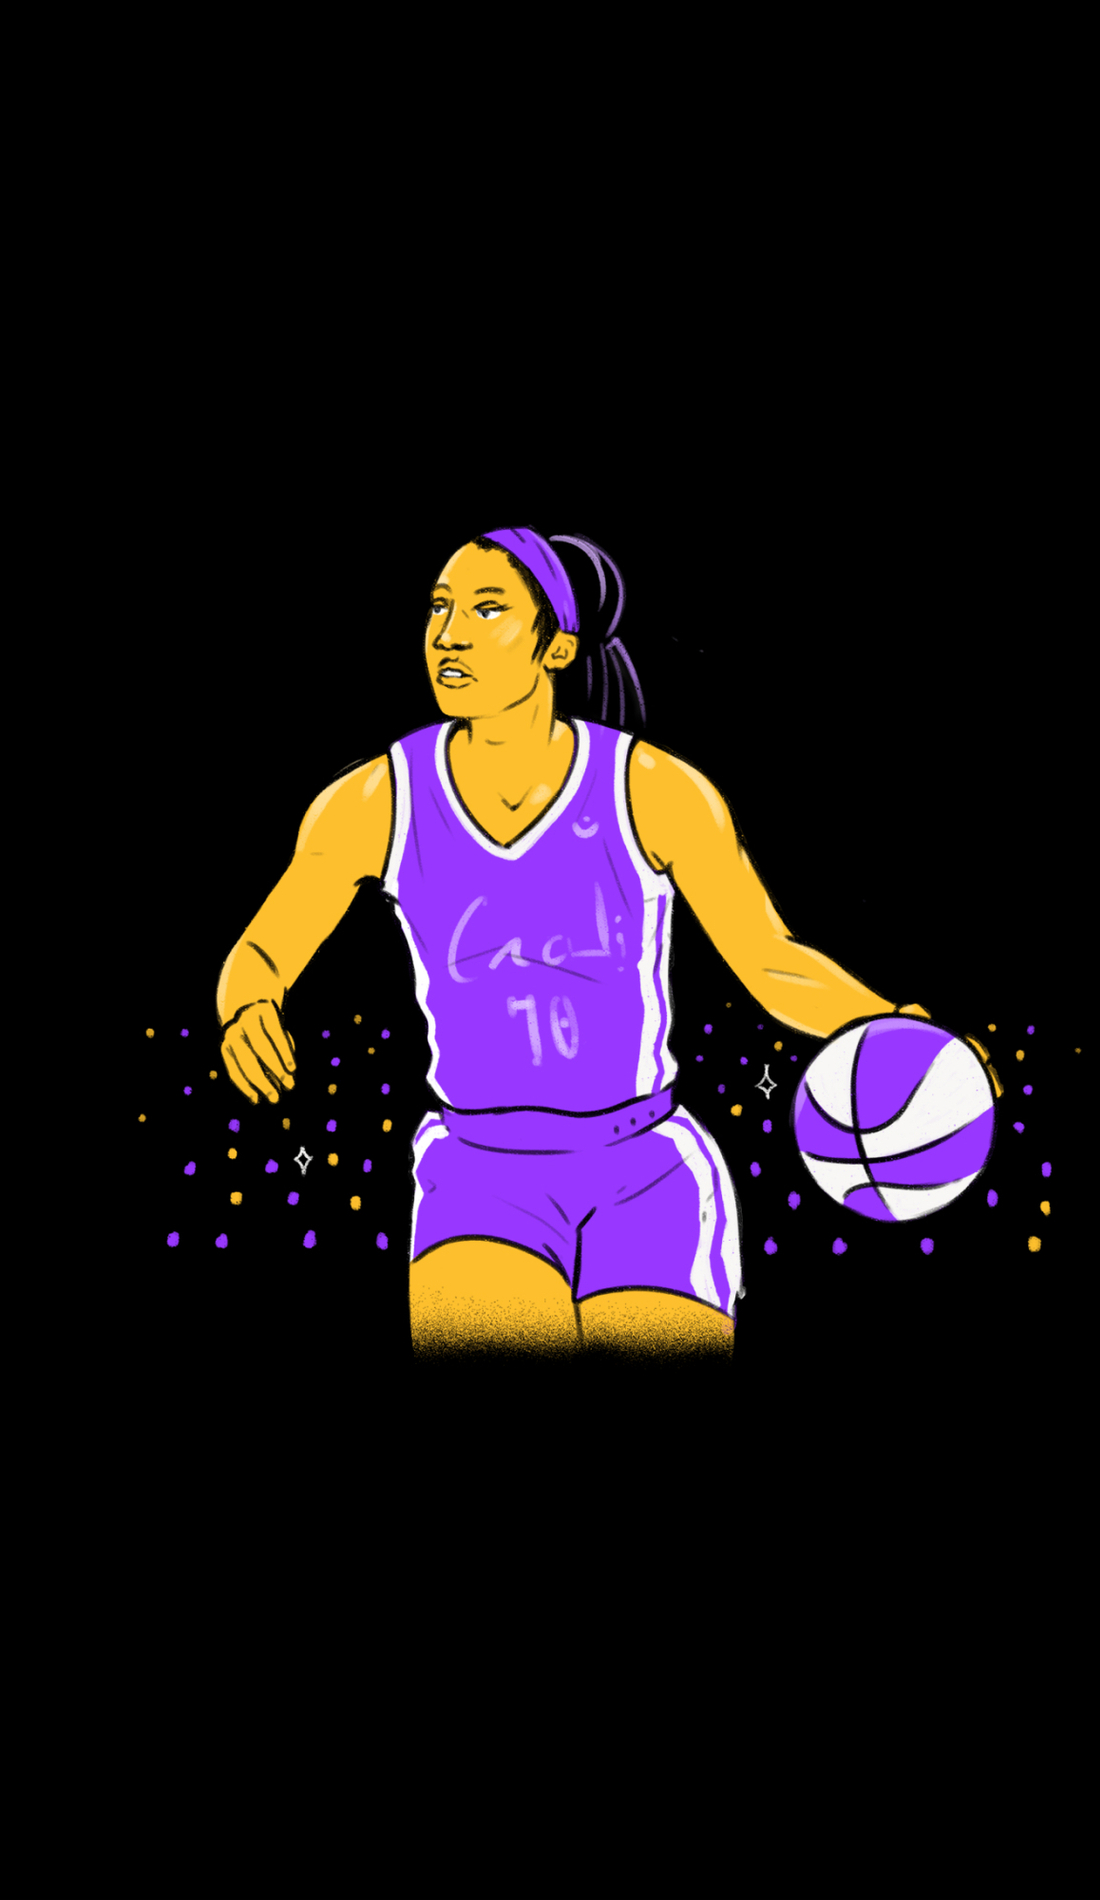 A Tarleton Texans Womens Basketball live event